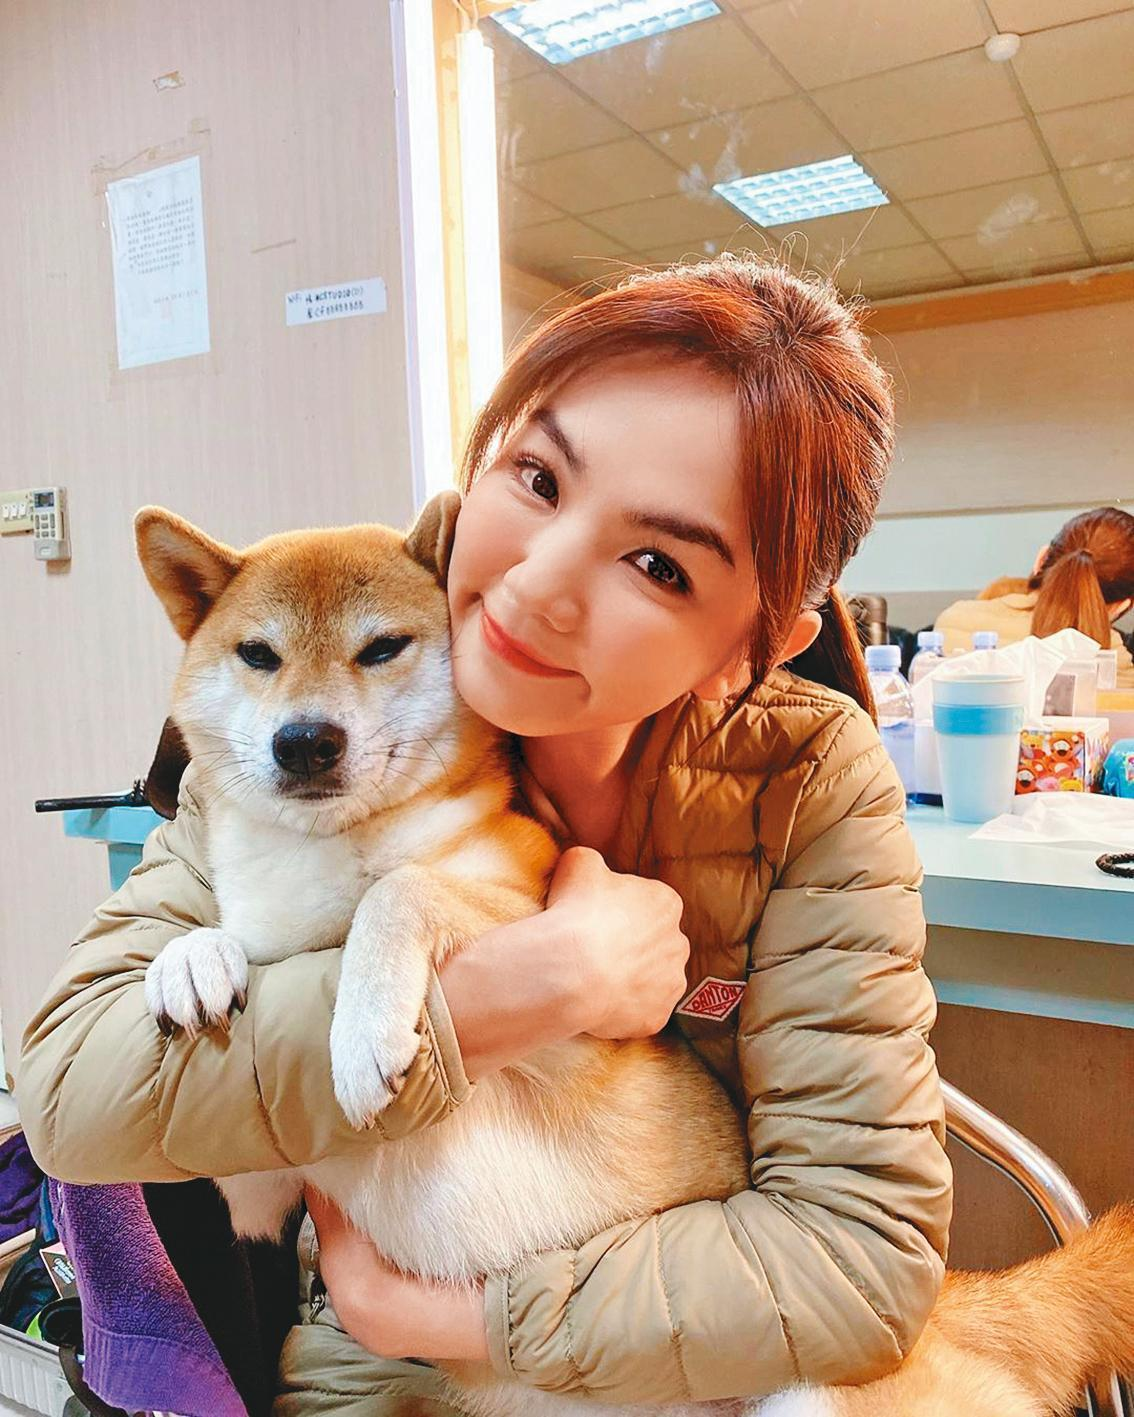 Ella因為愛犬布丁在家隨處大小便,與老公找上「熊爸」訓練,改善壞習慣。(翻攝自陳嘉樺Ella臉書)